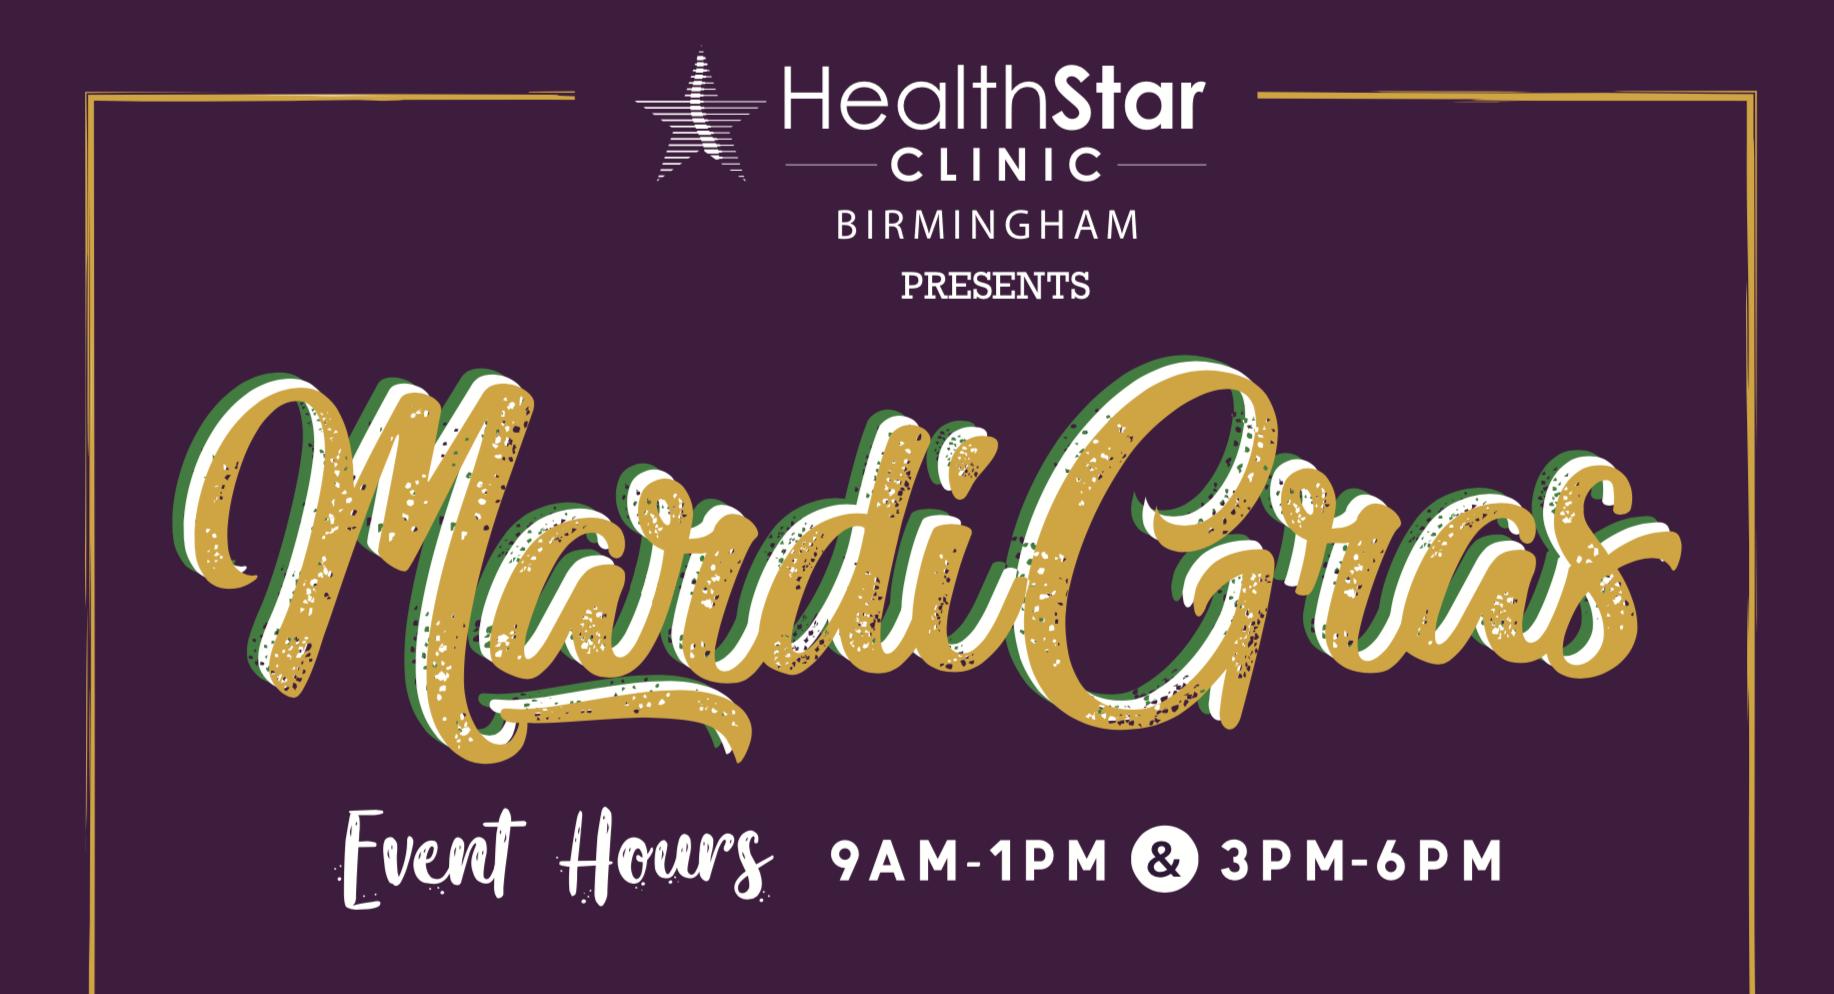 Party Like It's Mardi Gras! The 2020 HealthStar Patient Appreciation Day In Birmingham